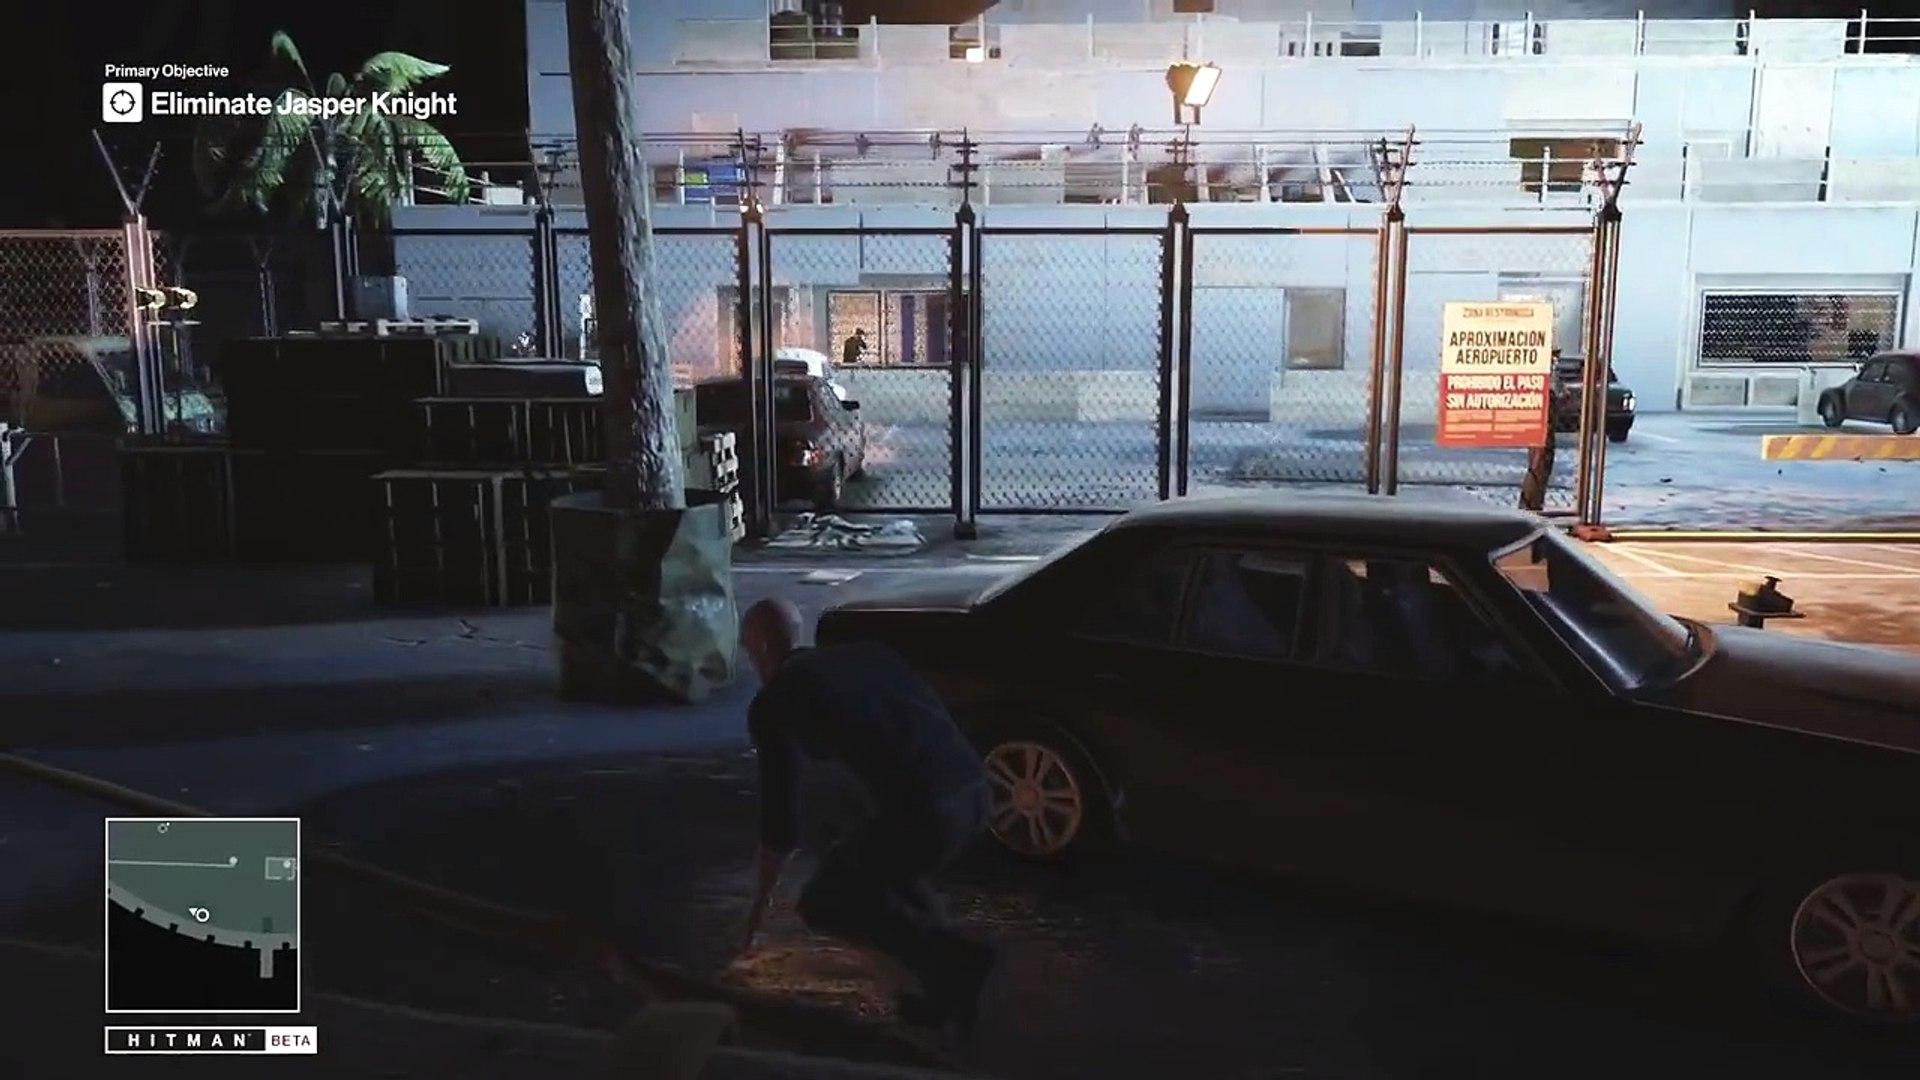 Hitman Walkthrough Gameplay Part 3 The Final Test Hitman 6 2016 Video Dailymotion